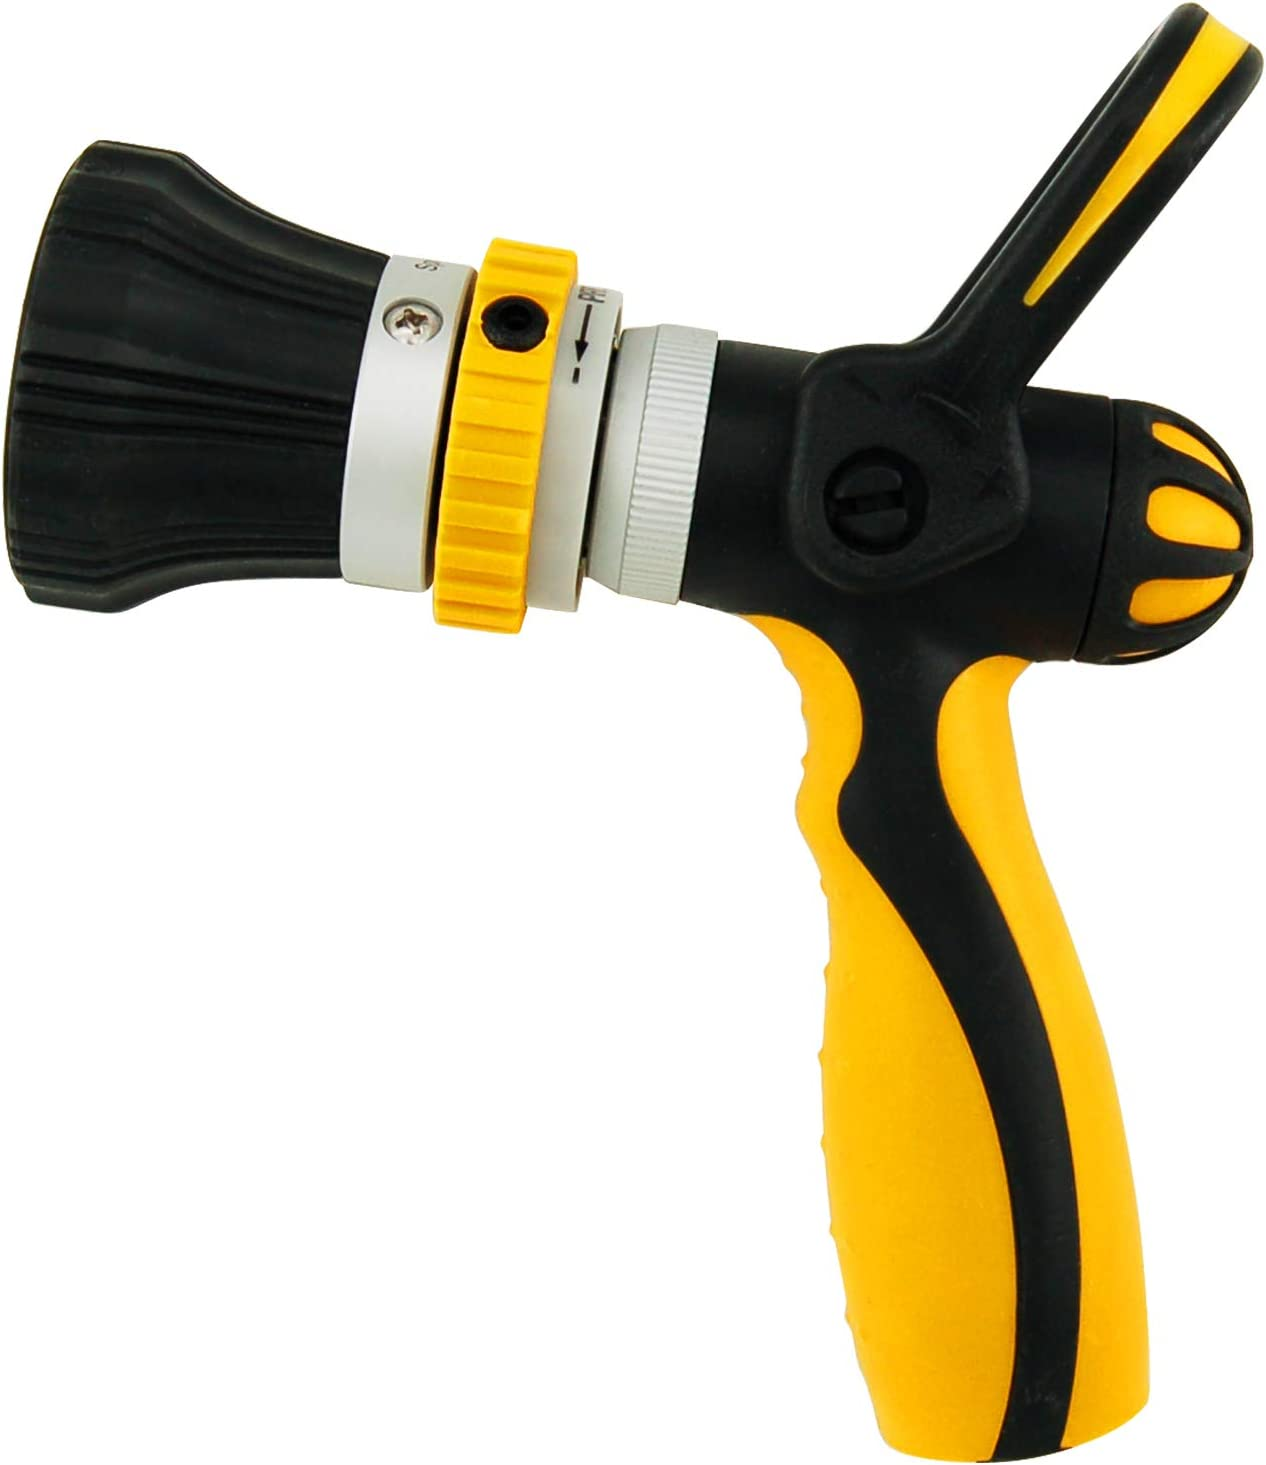 Centurion 996 High Pressure Fireman Nozzle Hose Nozzle, Heavy Duty Water Nozzle with Lever Control Handle